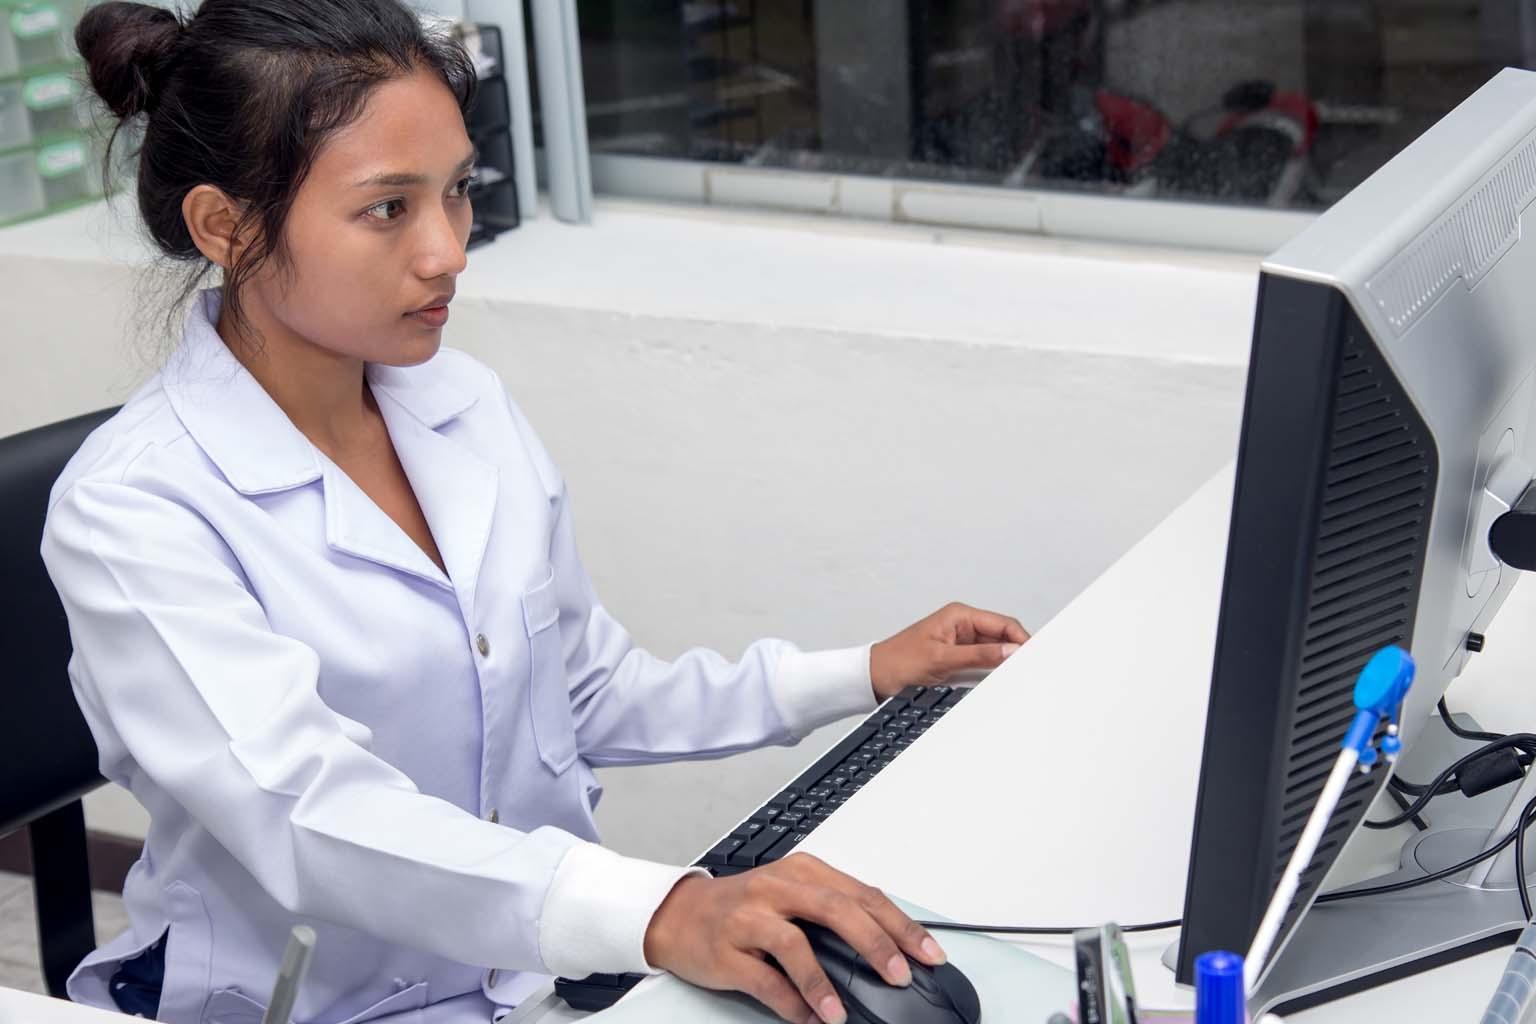 pharmacist using computer in pharmacy